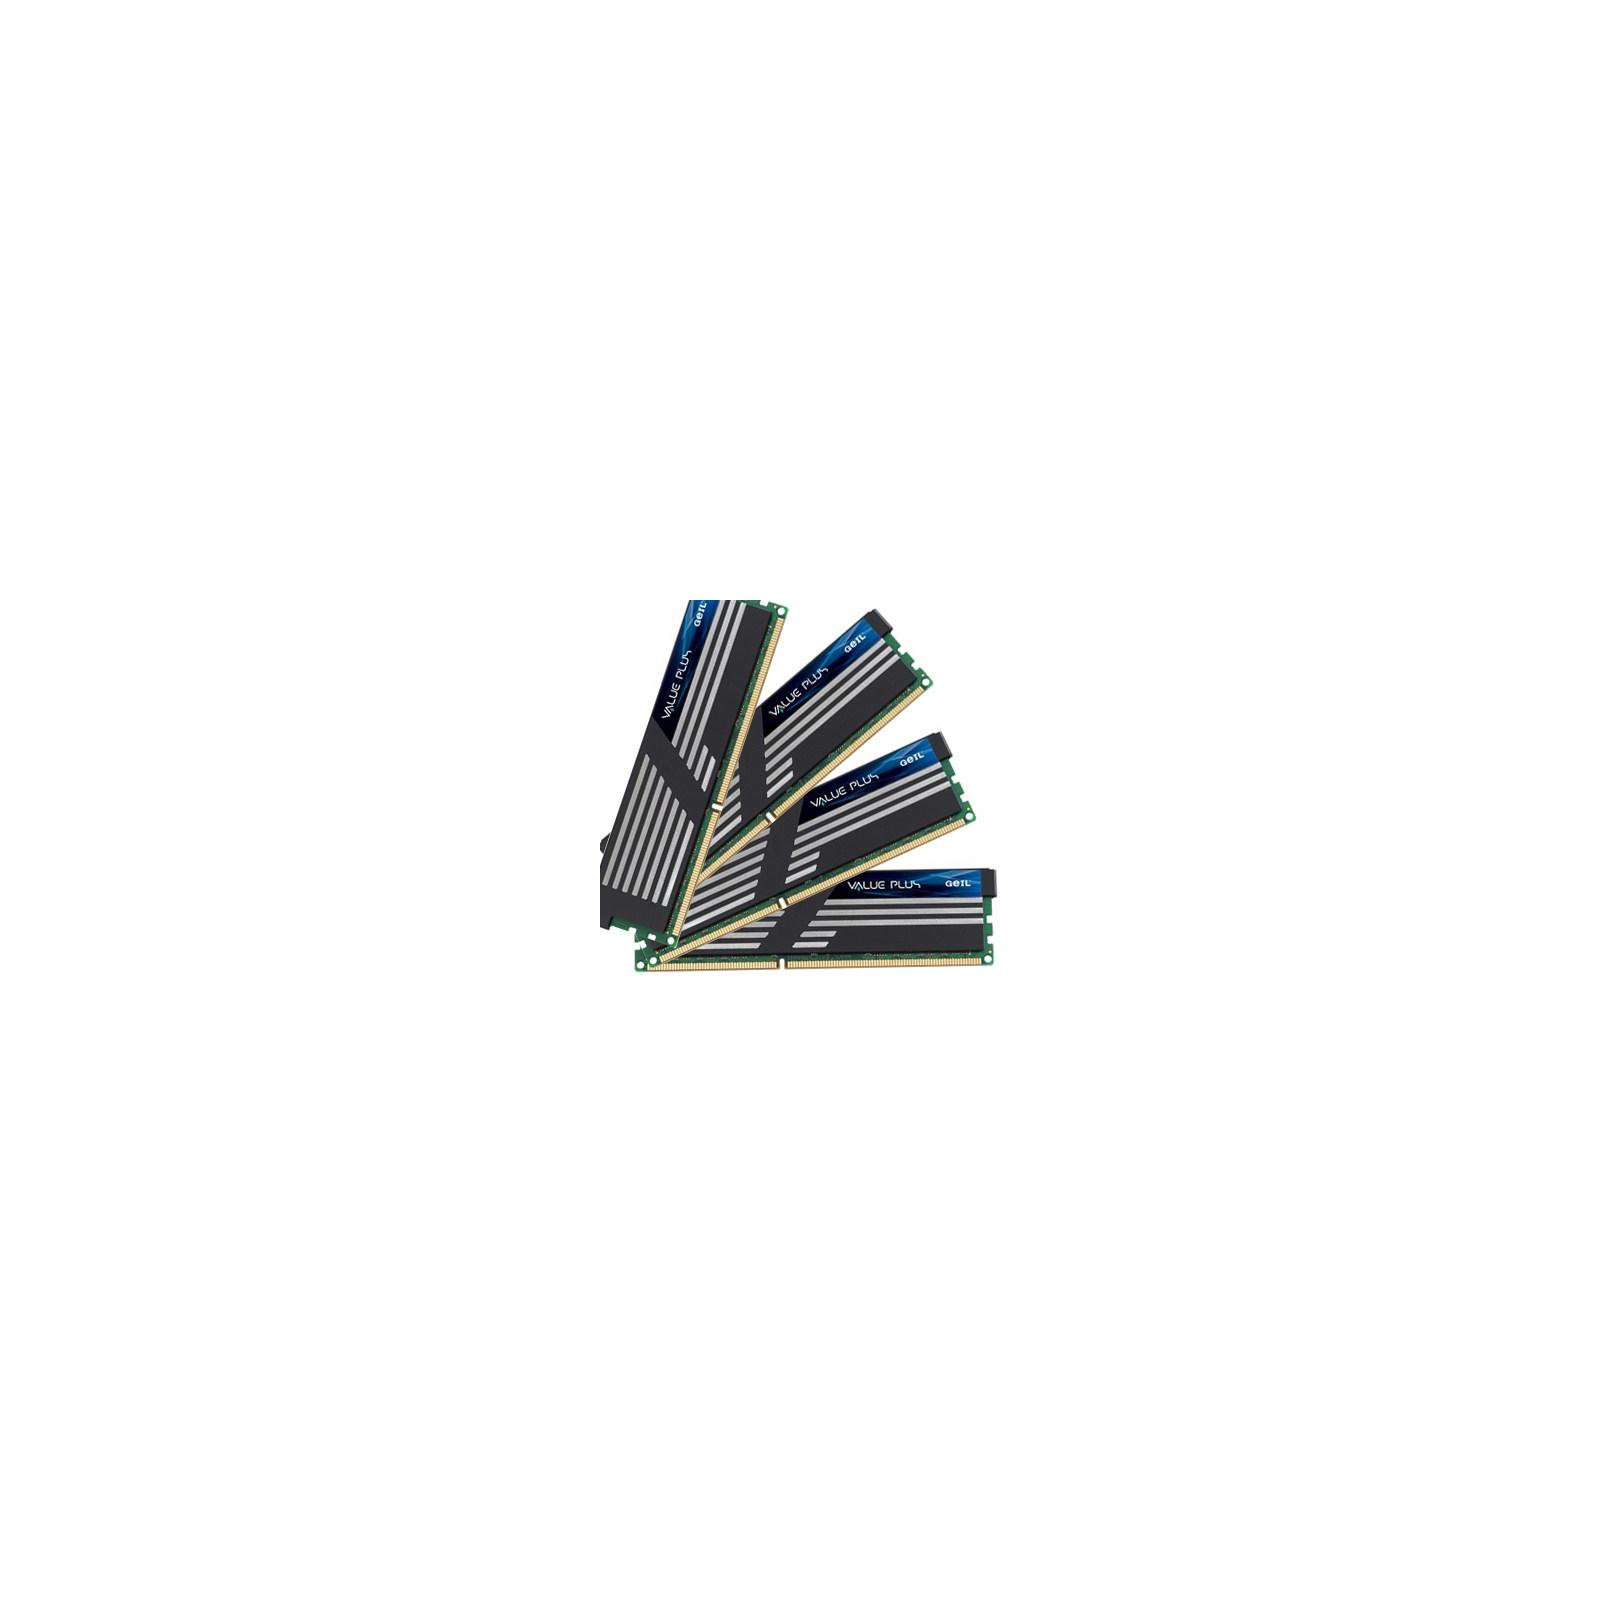 Модуль памяти для компьютера DDR3 8GB (2x4GB) 1600 MHz GEIL (GVP38GB1600C9DC)